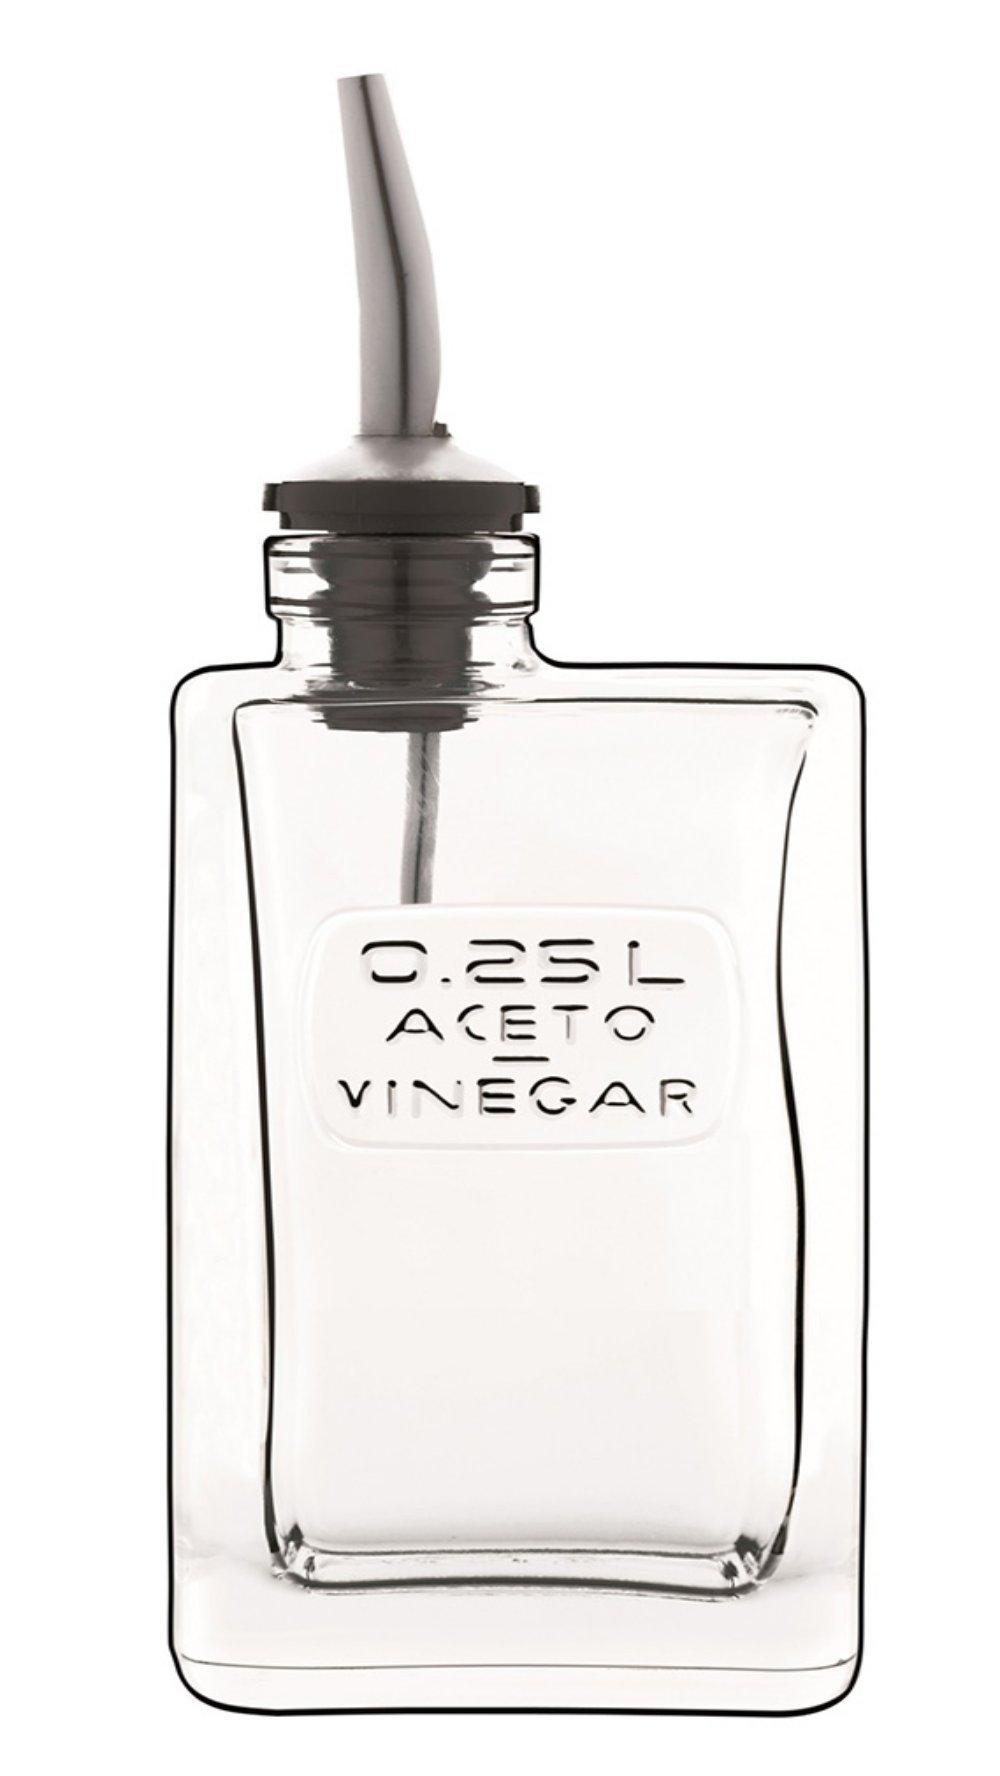 Bormioli Luigi:Optima Vinegar Bottle with Stopper, 8.45 Fluid Ounces (250mL) Capacity